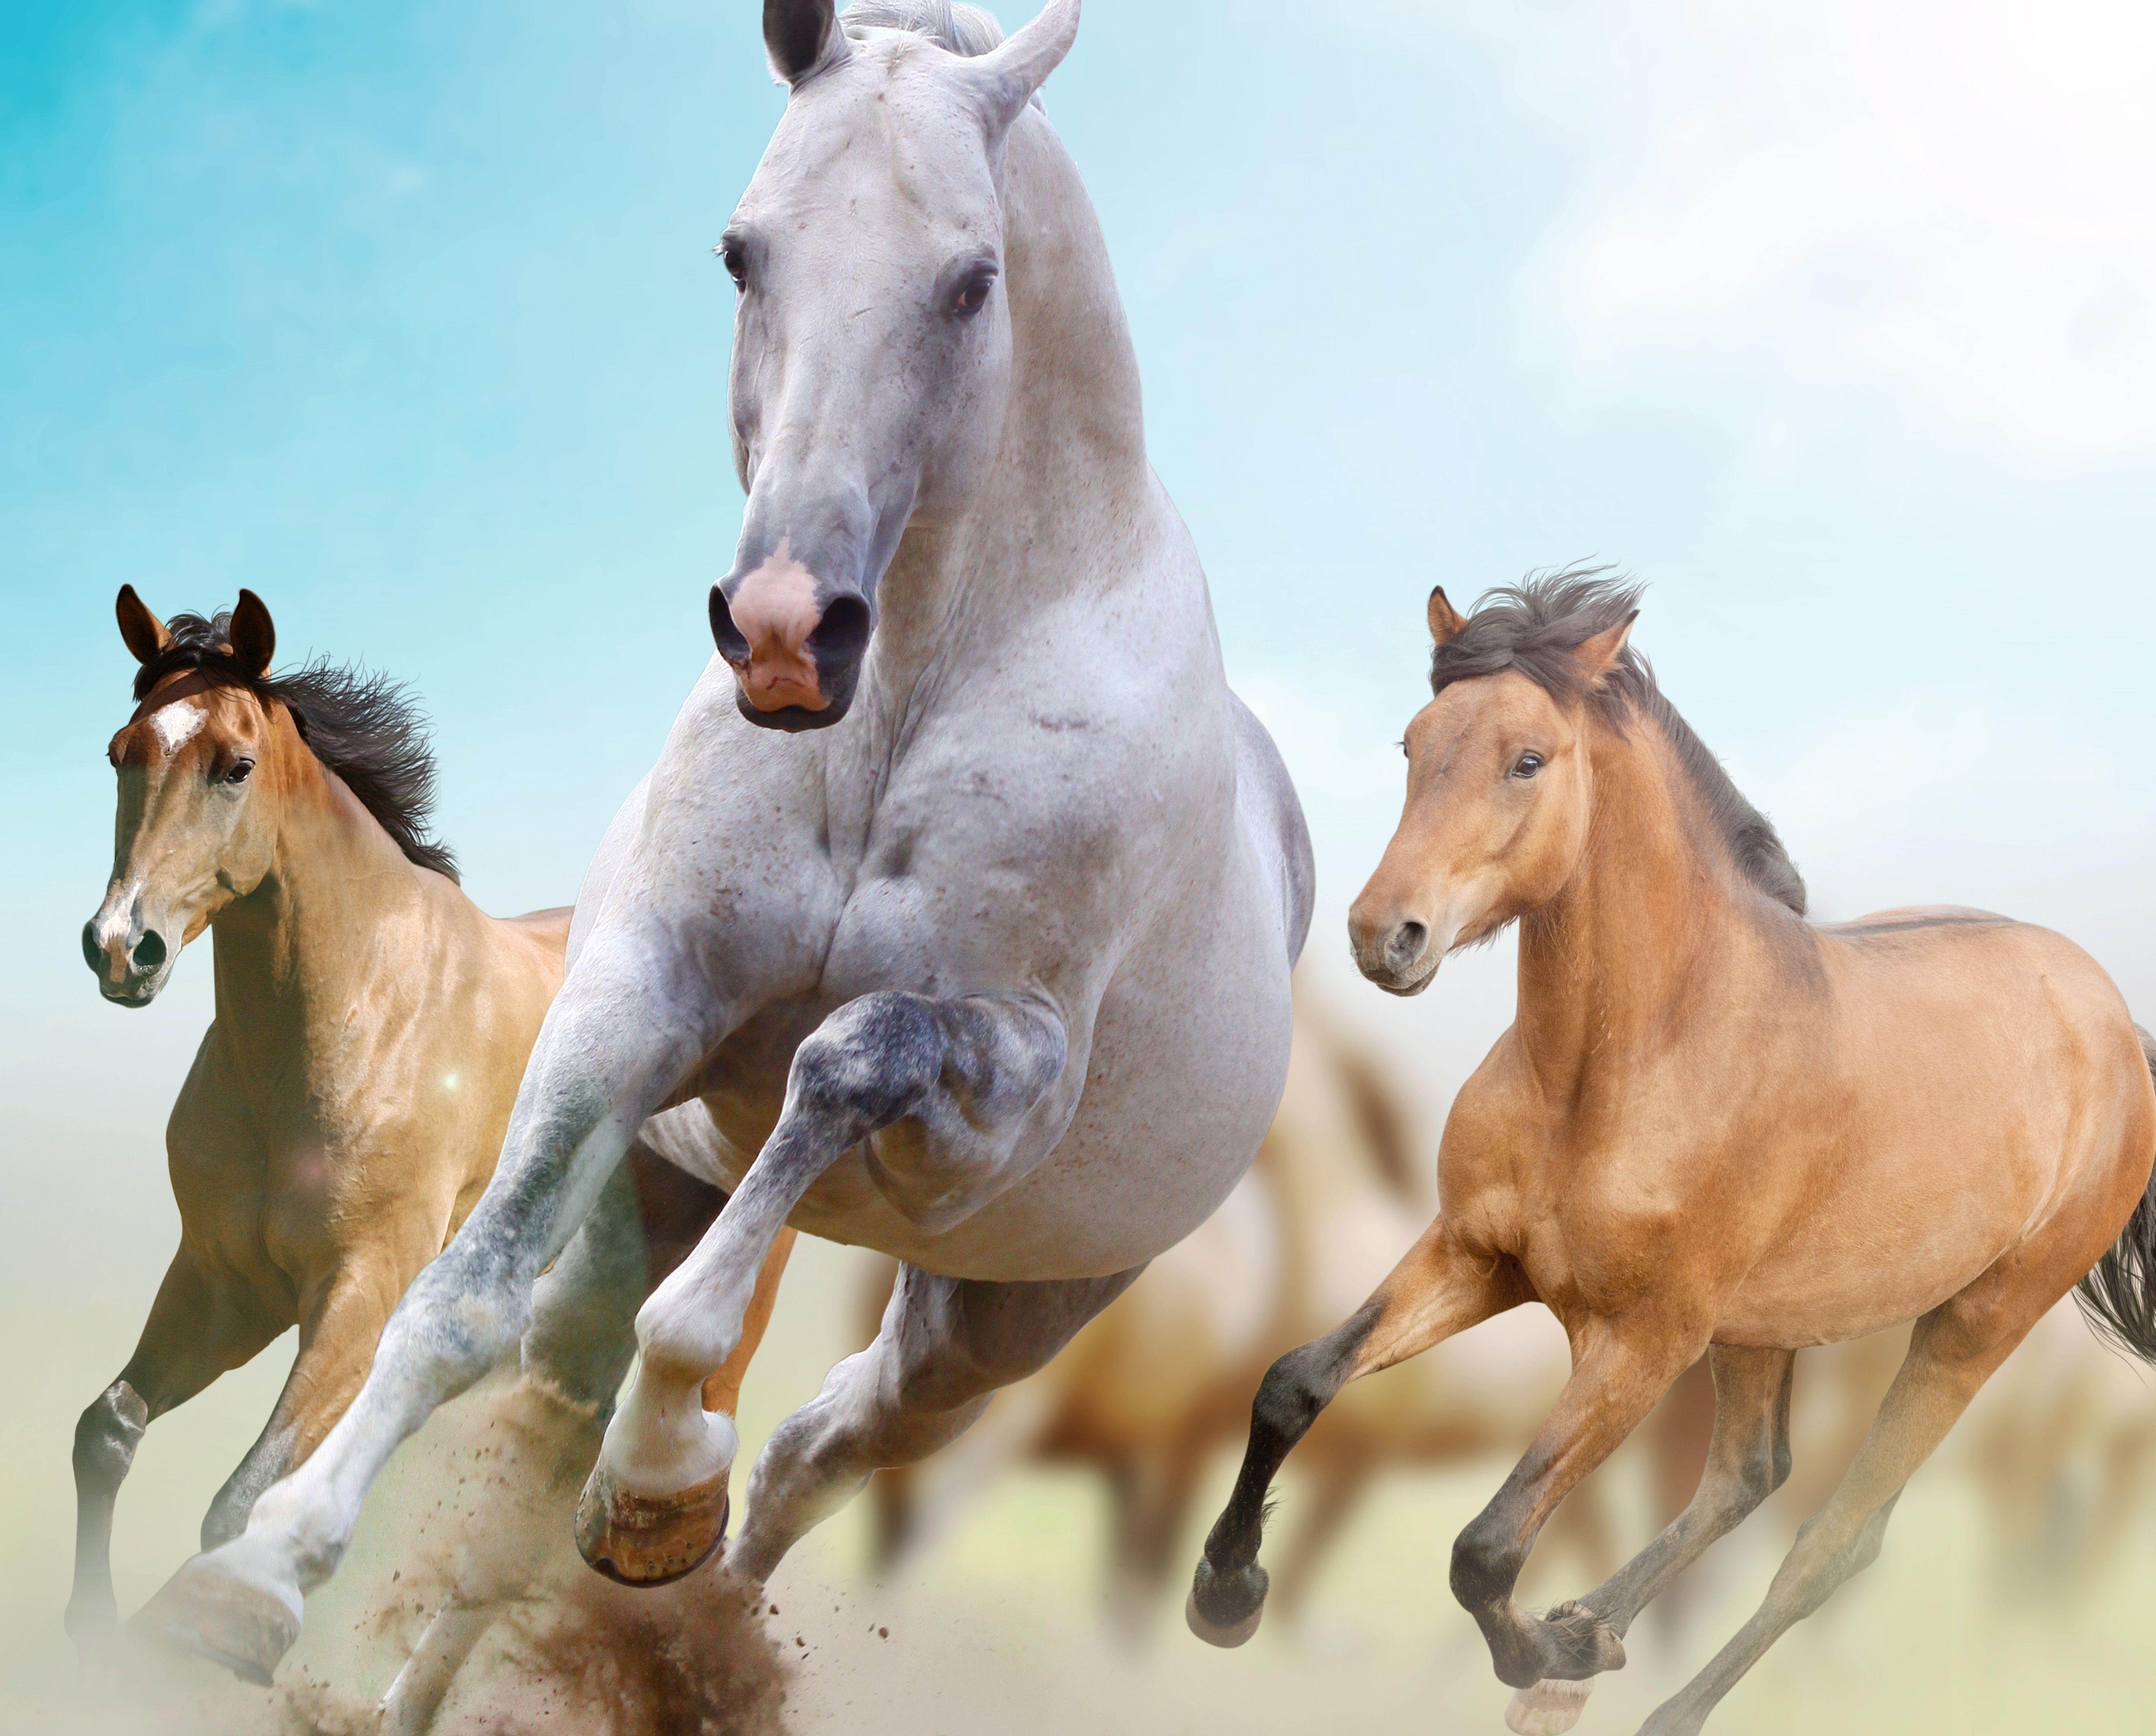 7 running horse wallpaper desktop background: Running Horses Wallpapers